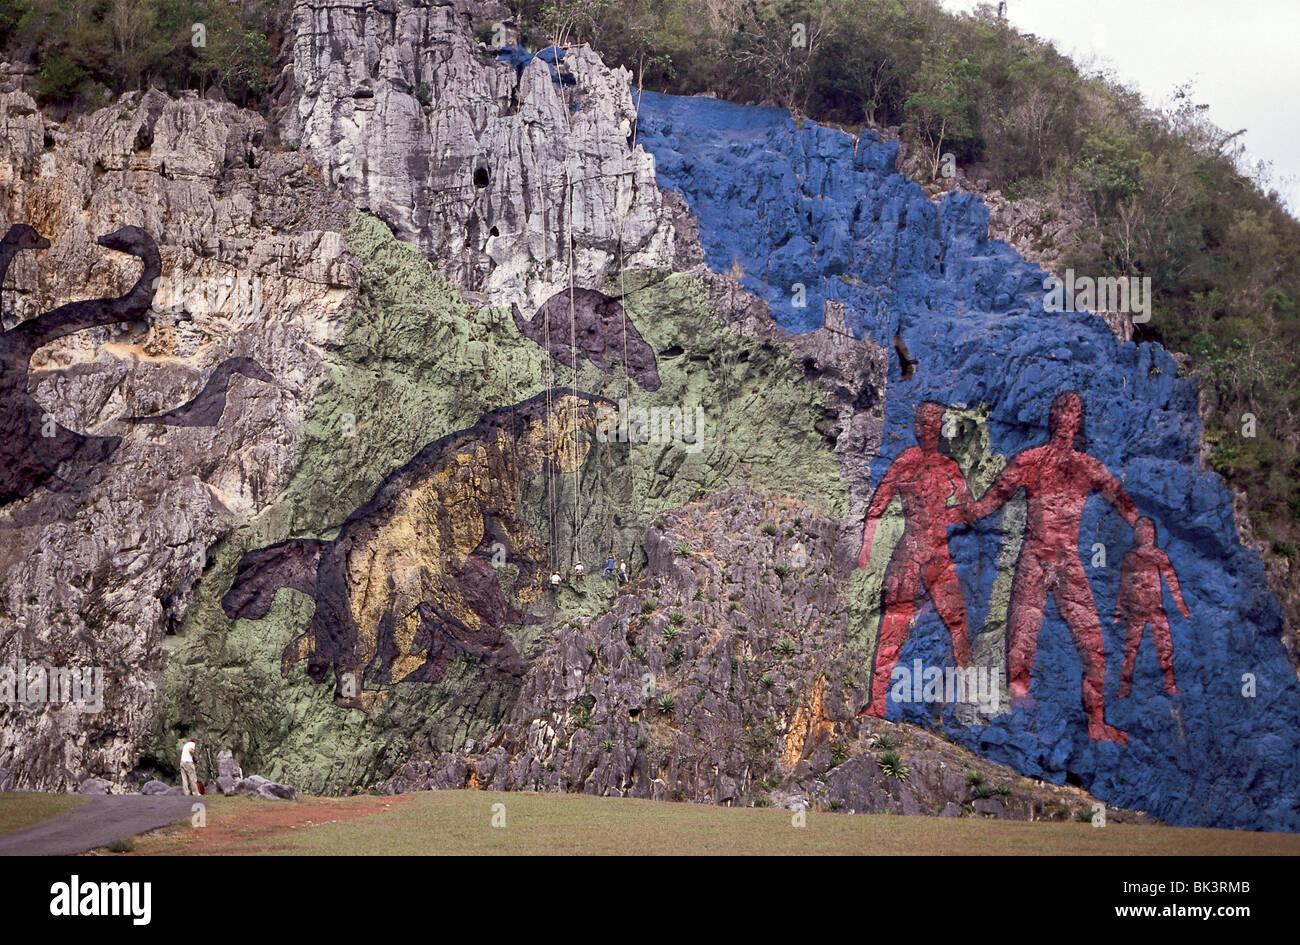 Mural de la Prehistoria (The Mural of Prehistory) measures 120 meters by 180 meters & depicts evolution of humans - Stock Image